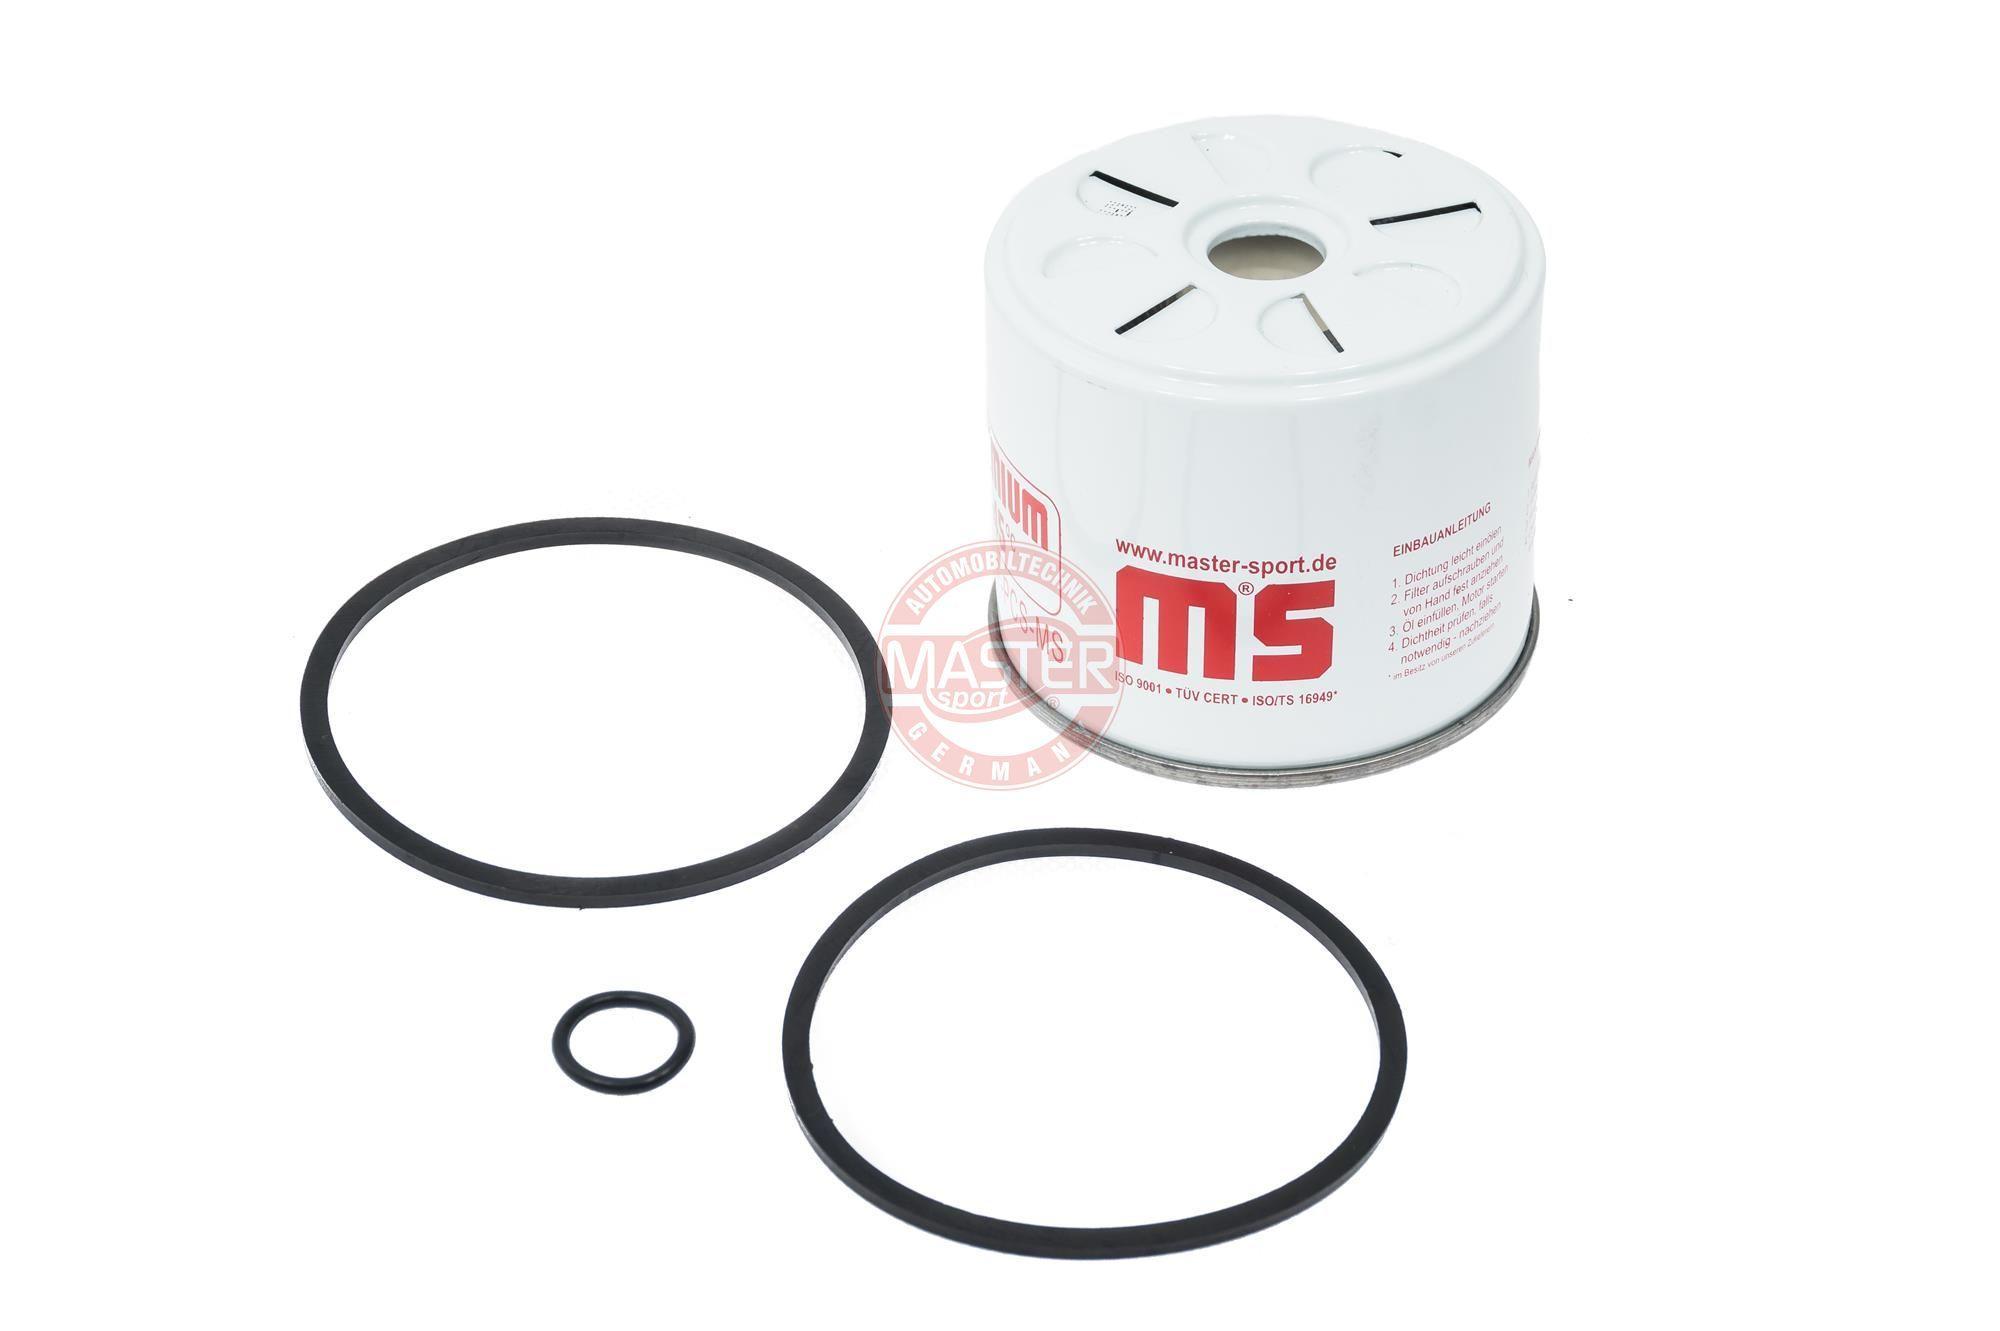 Leitungsfilter 917X-KF-PCS-MS MASTER-SPORT 430009170 in Original Qualität